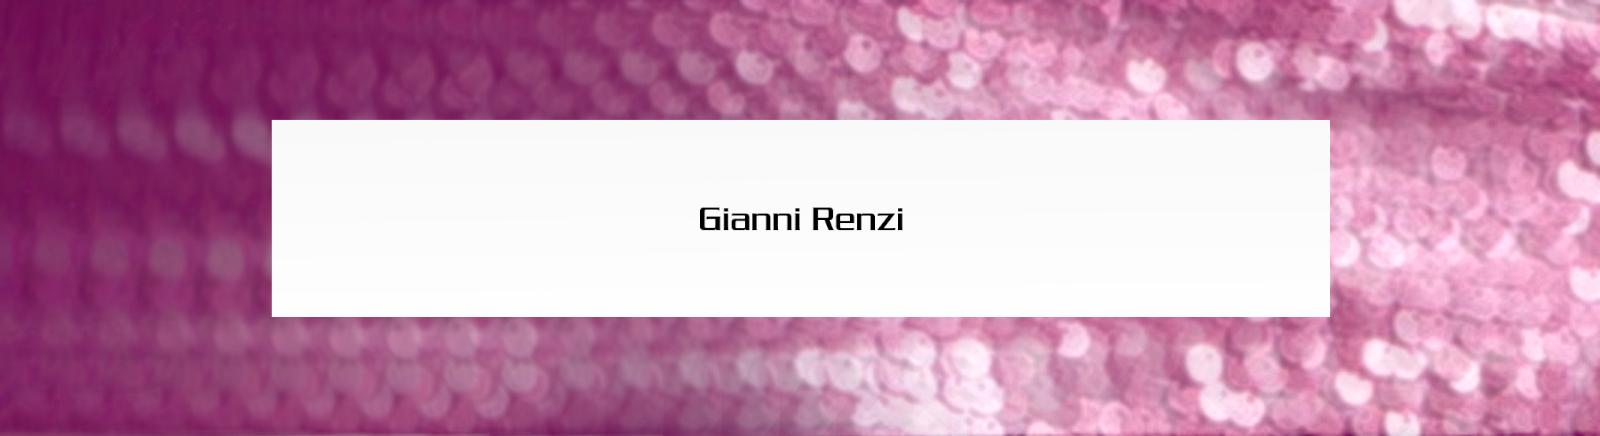 Gisy: Gianni Renzi Sneaker für Herren online shoppen